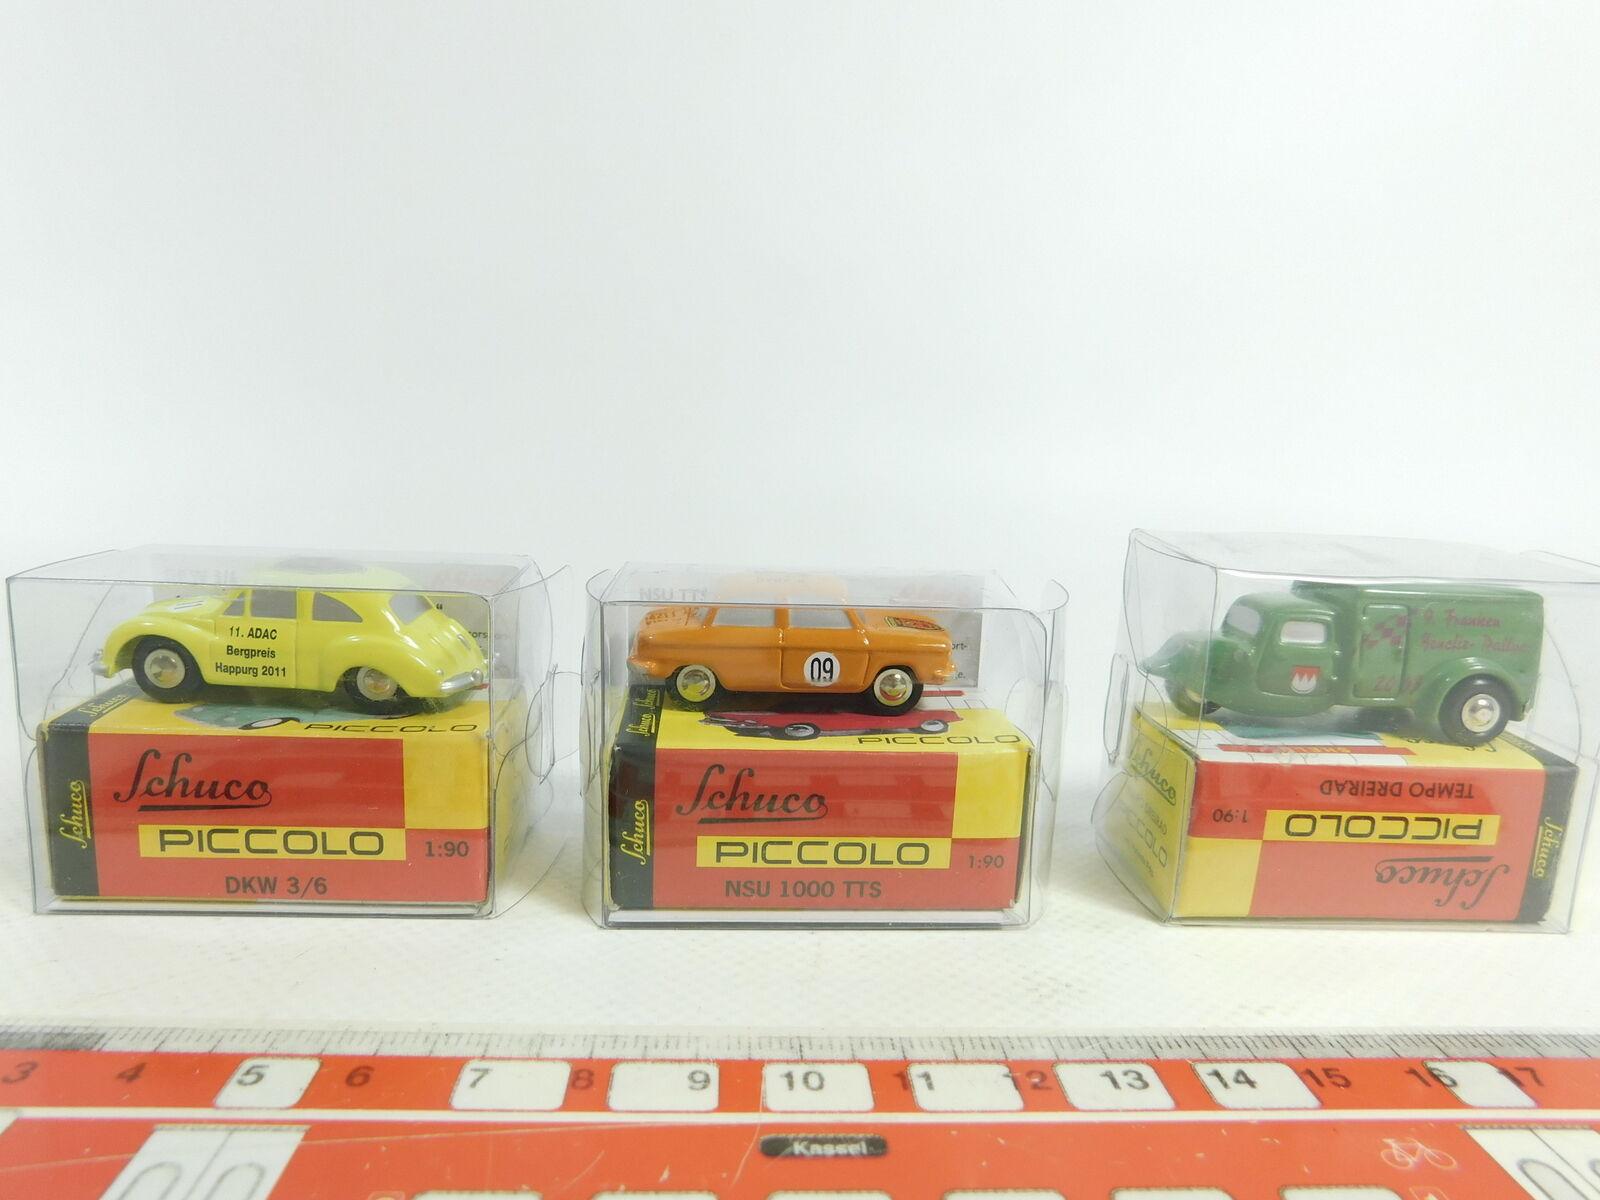 Bd275-0, 5  3x Schuco 1 90 modelo  ritmo + NSU montaña precio + DKW happurg 2011, Neuw + embalaje original